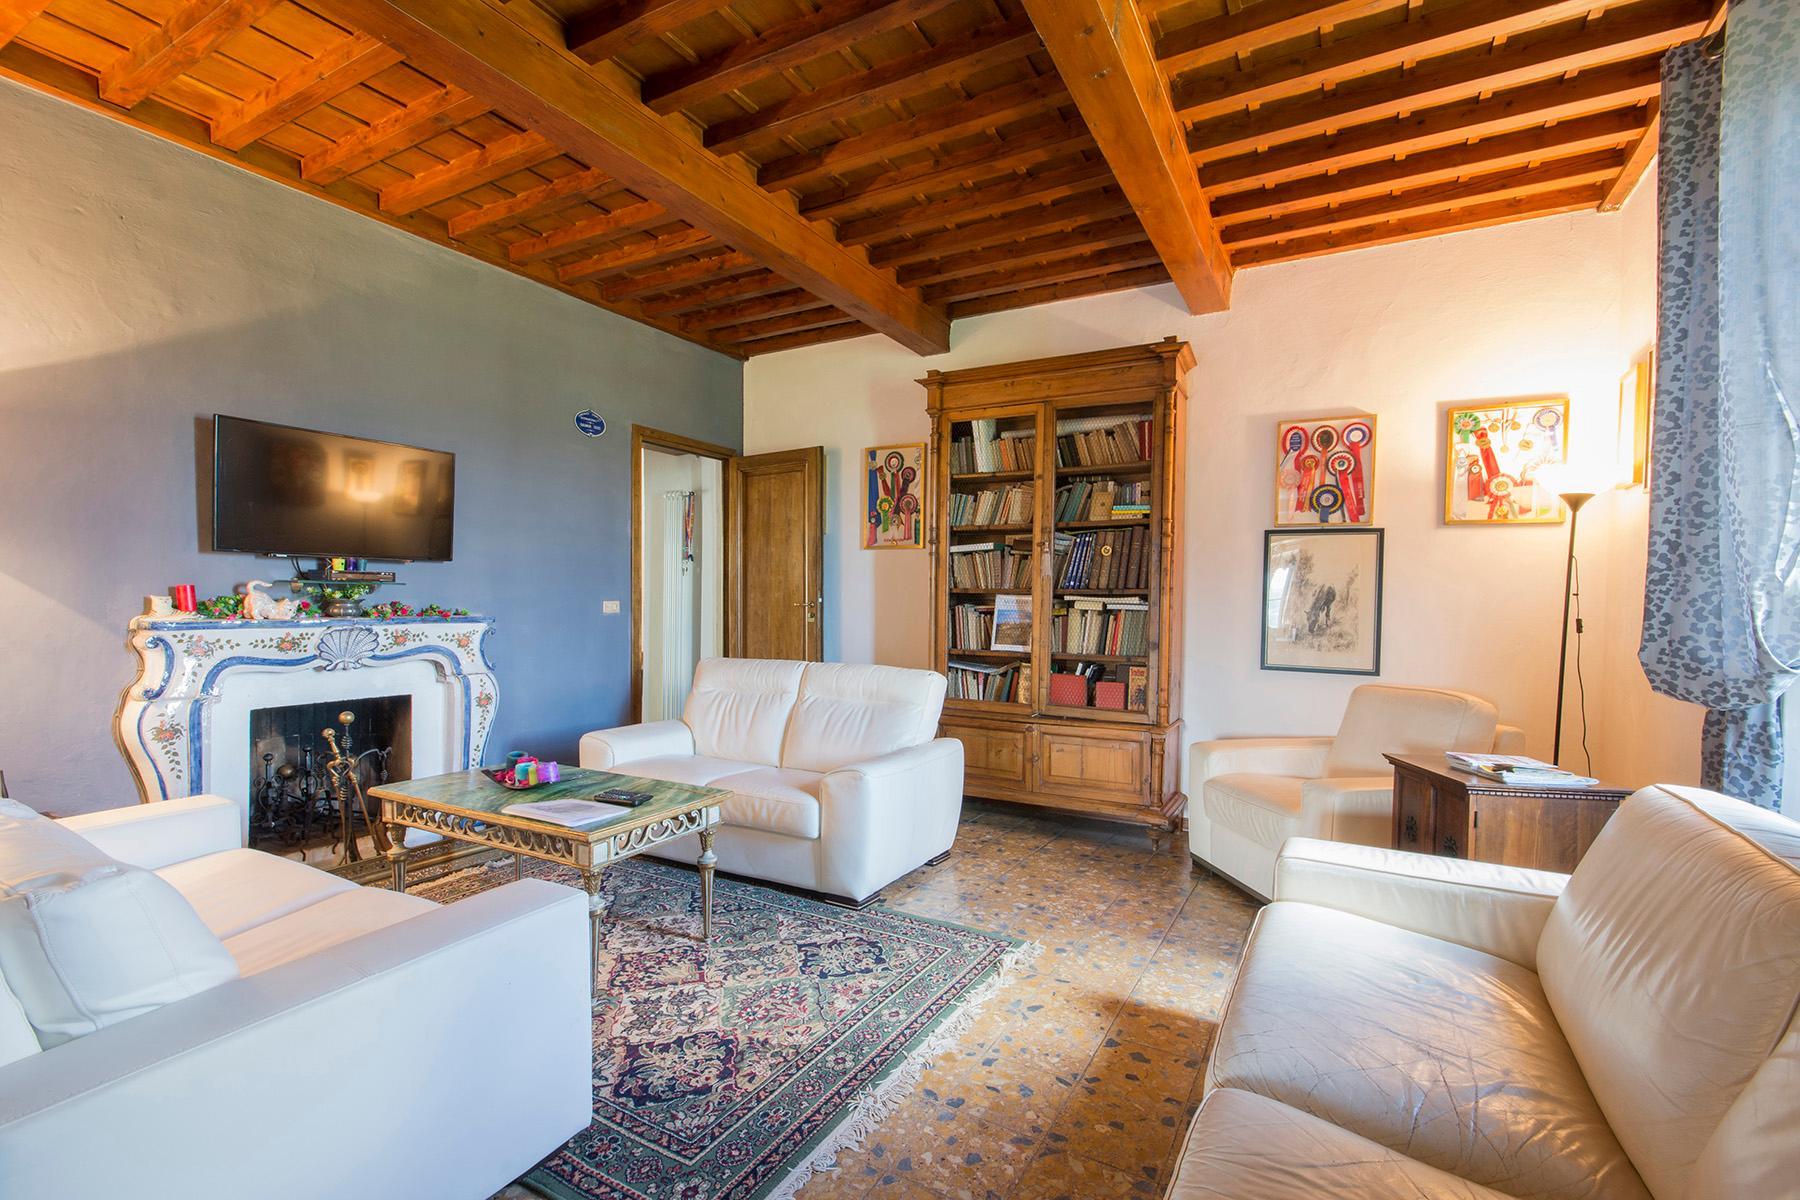 Villa charmante dans dans la Val di Sieve - 16